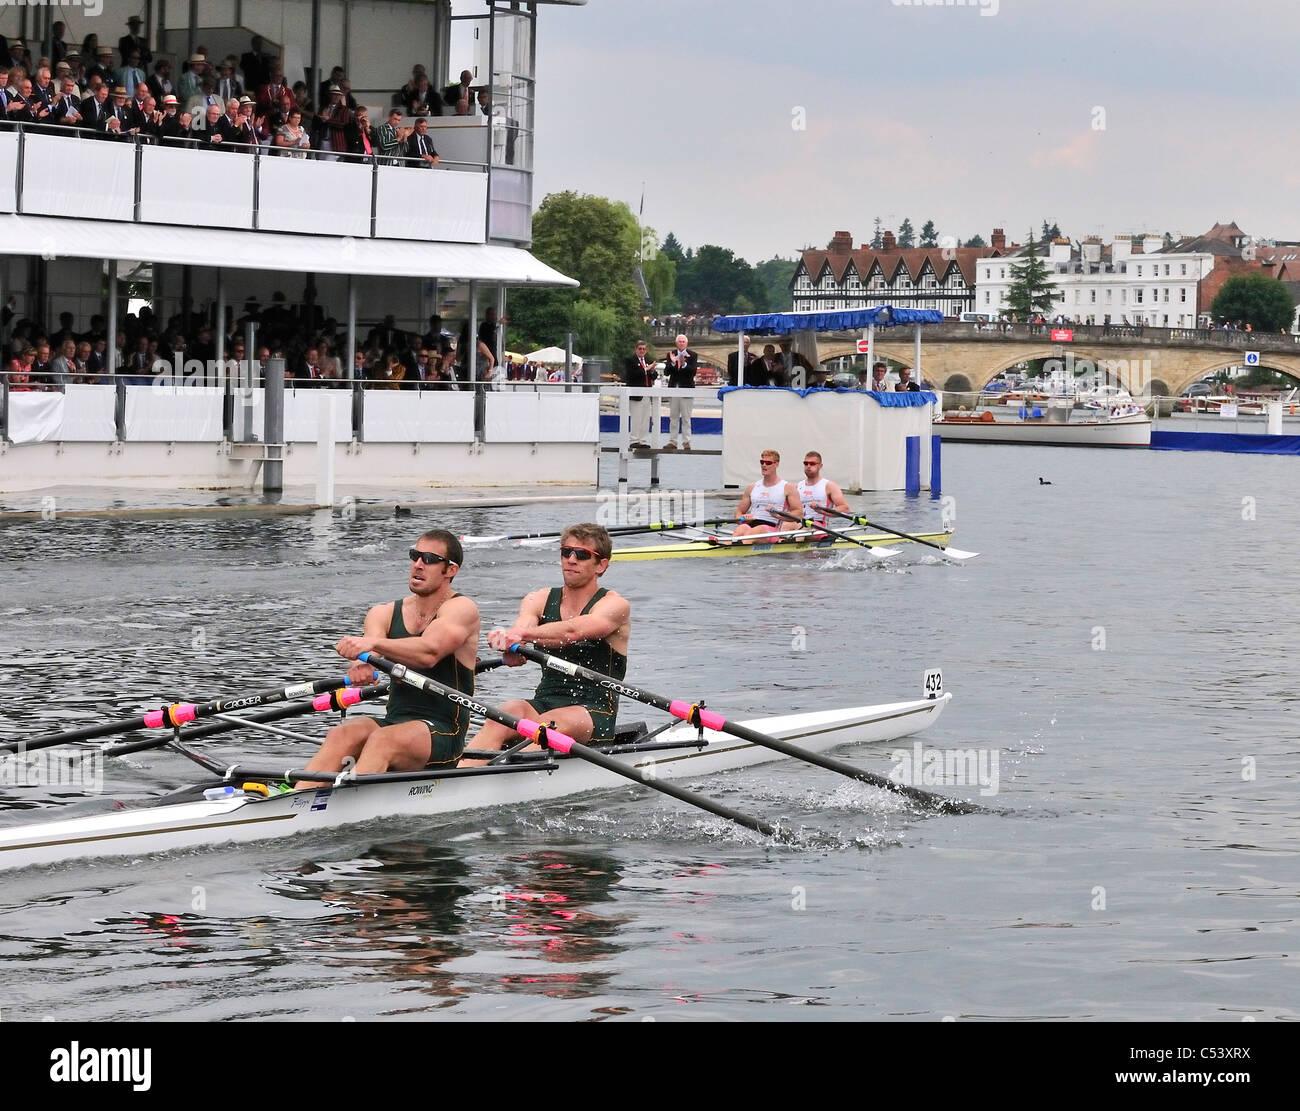 Henley Royal Regatta Finals 2011 M.W.Wells & R.M. Bateman (Leander Club)beat D.W. Crawshay & S.Brennan - Stock Image